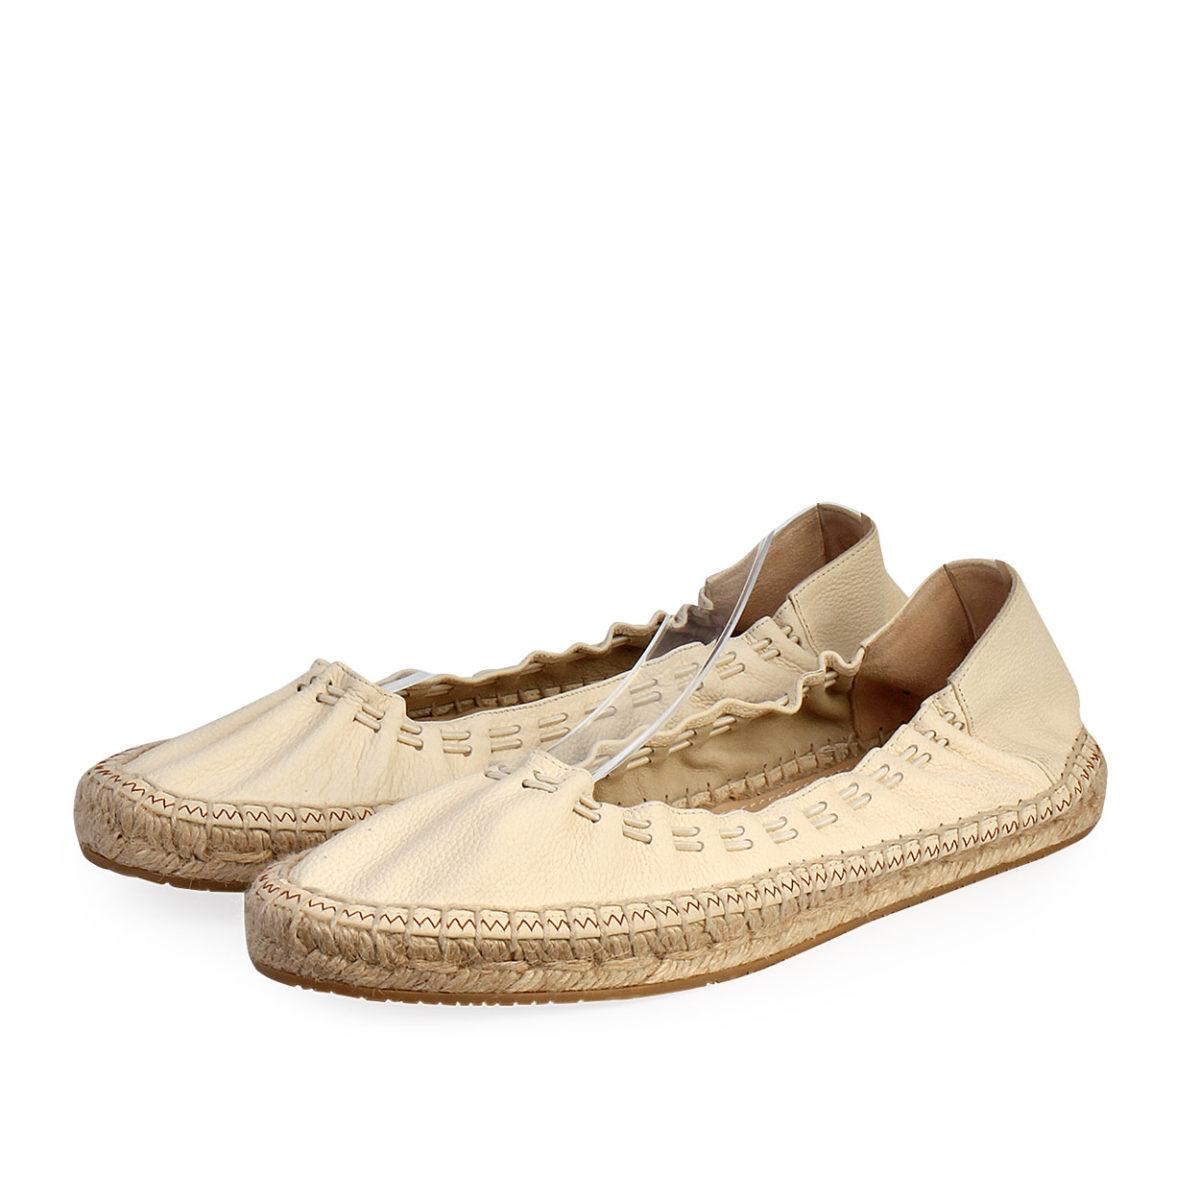 c3c50039cc497 JIMMY CHOO Leather Deena Stretch Espadrilles Cream - S: 39.5 (6 ...